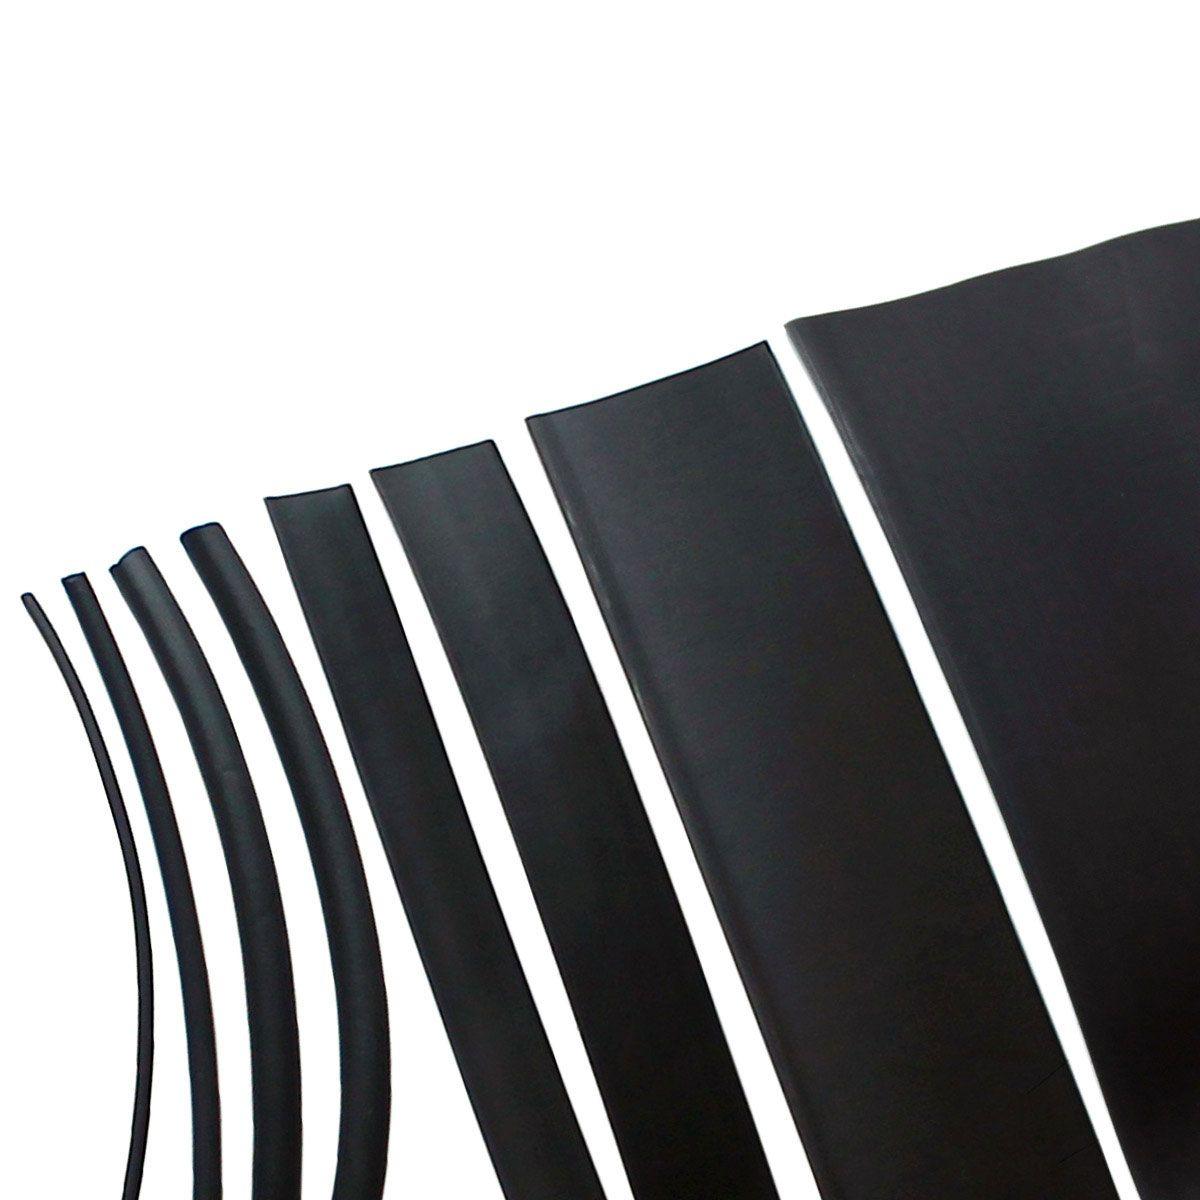 Espaguete Isolante / Tubo Termo Retrátil Espessura 2mm | Comprimento 1 Metro